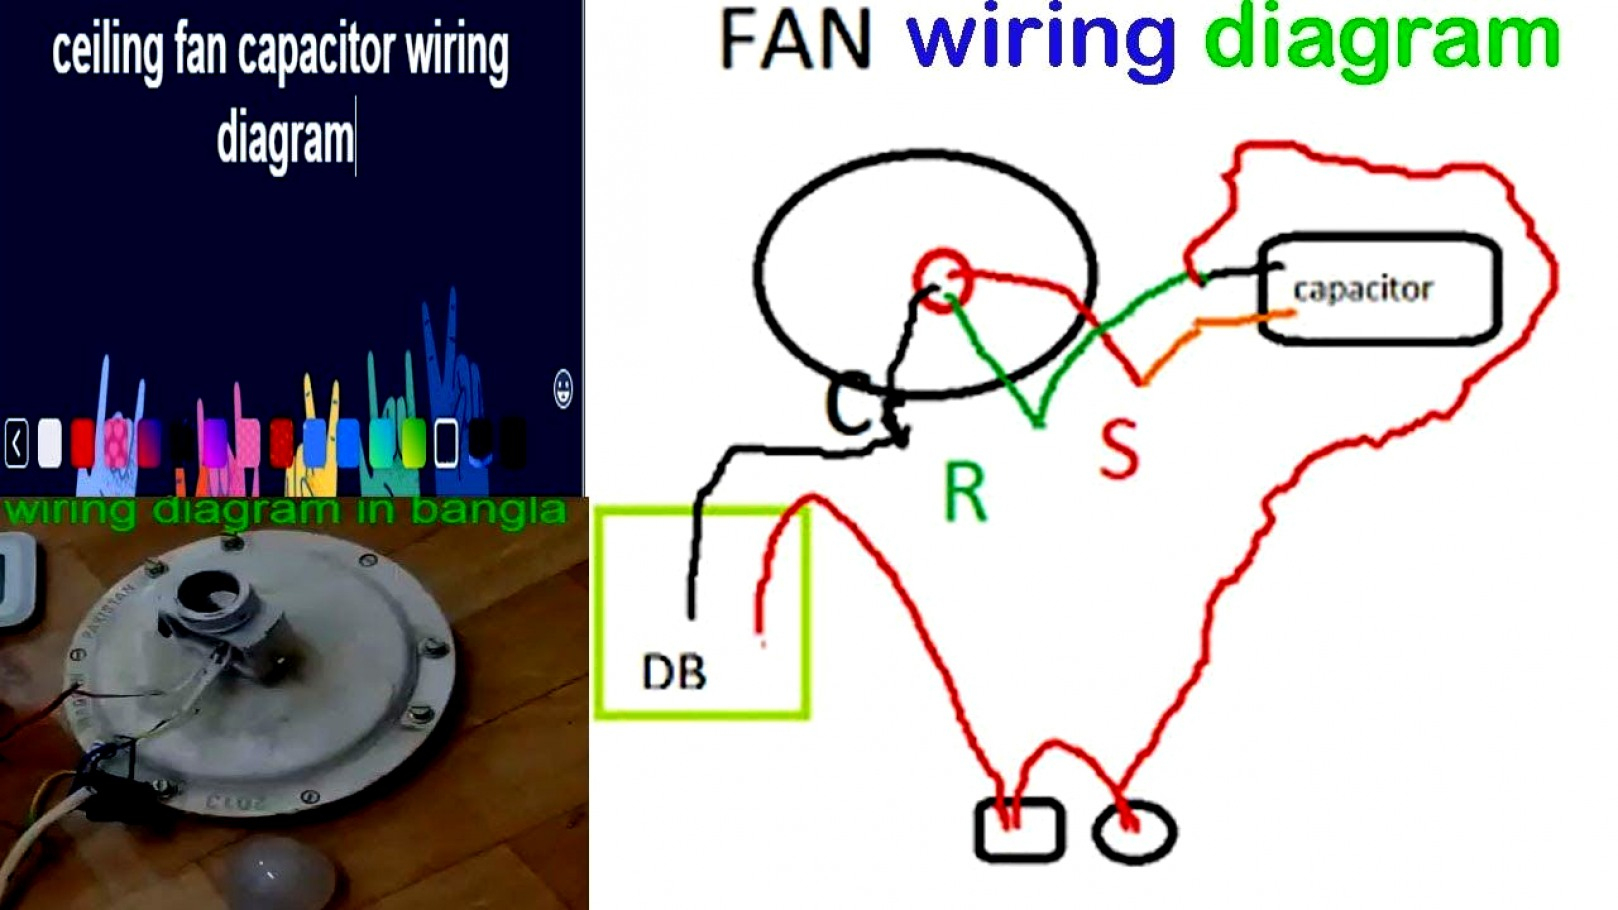 Turbo 200 Capacitor Wiring Diagram   Wiring Diagram - Ac Dual Capacitor Wiring Diagram